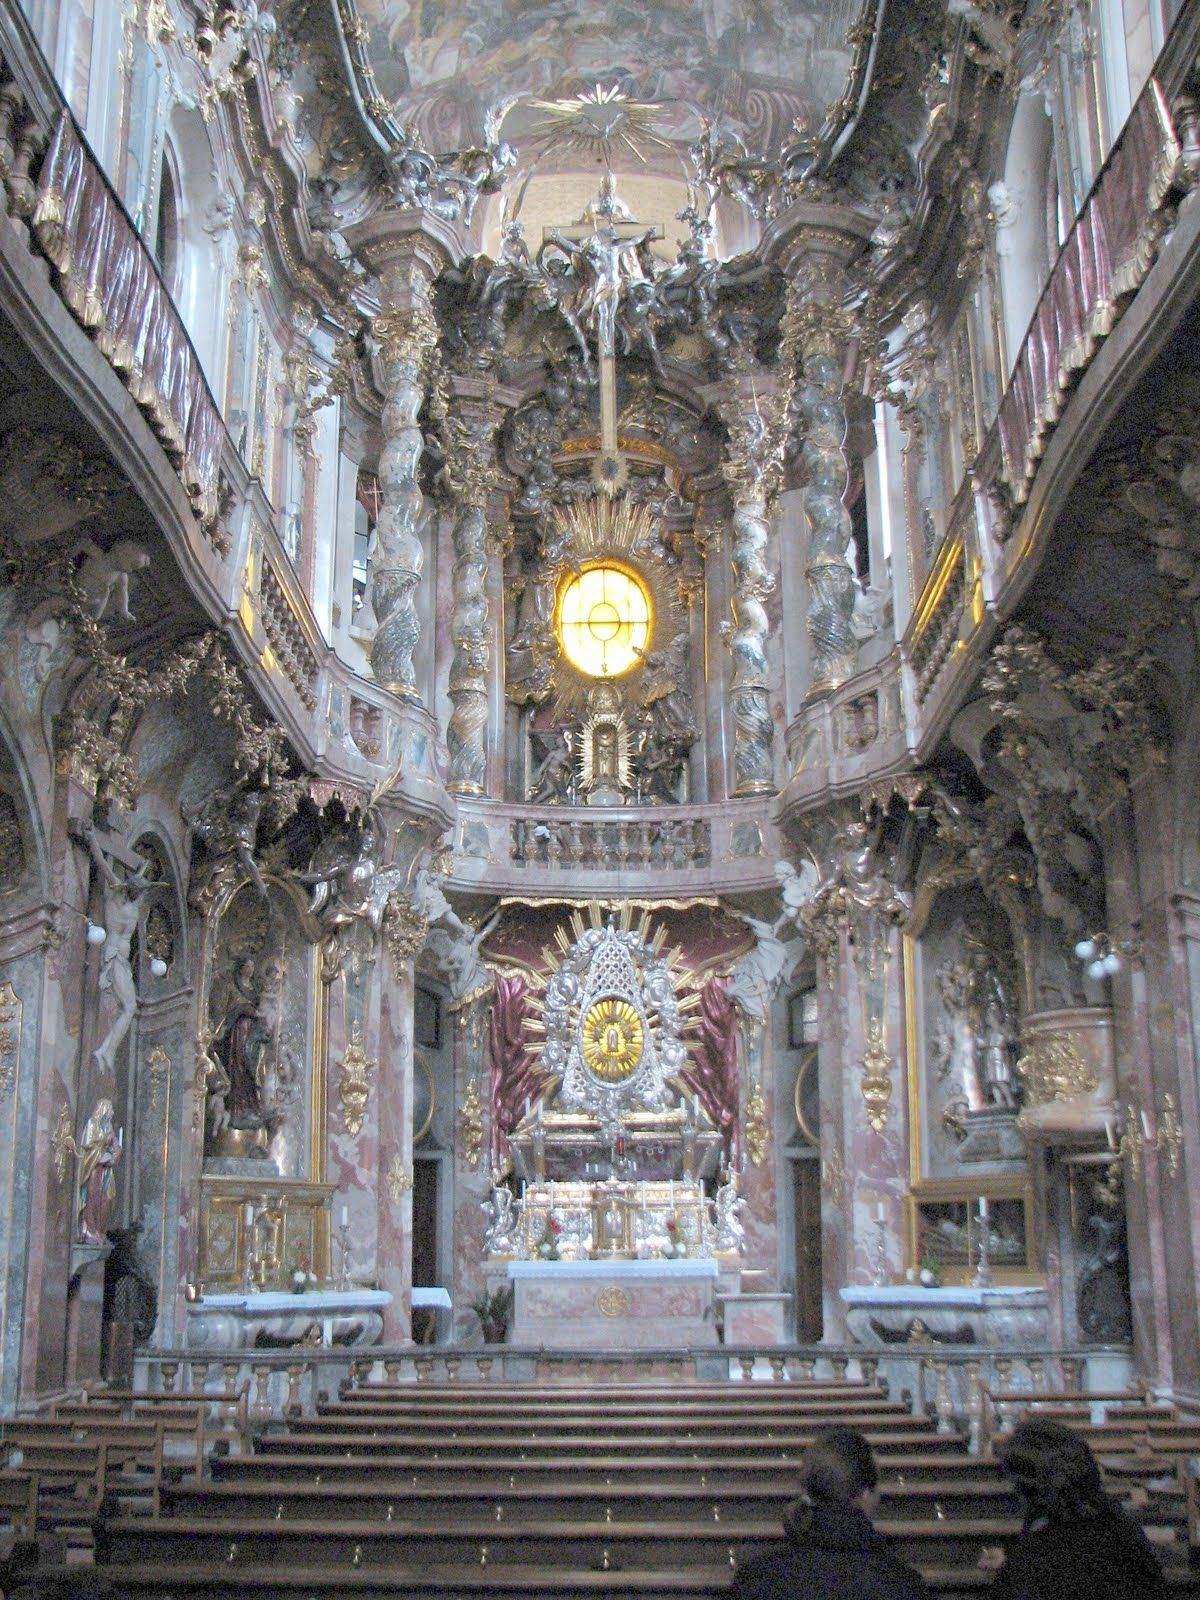 Bavarian Baroque Baroque Architecture Architecture Layout Architecture